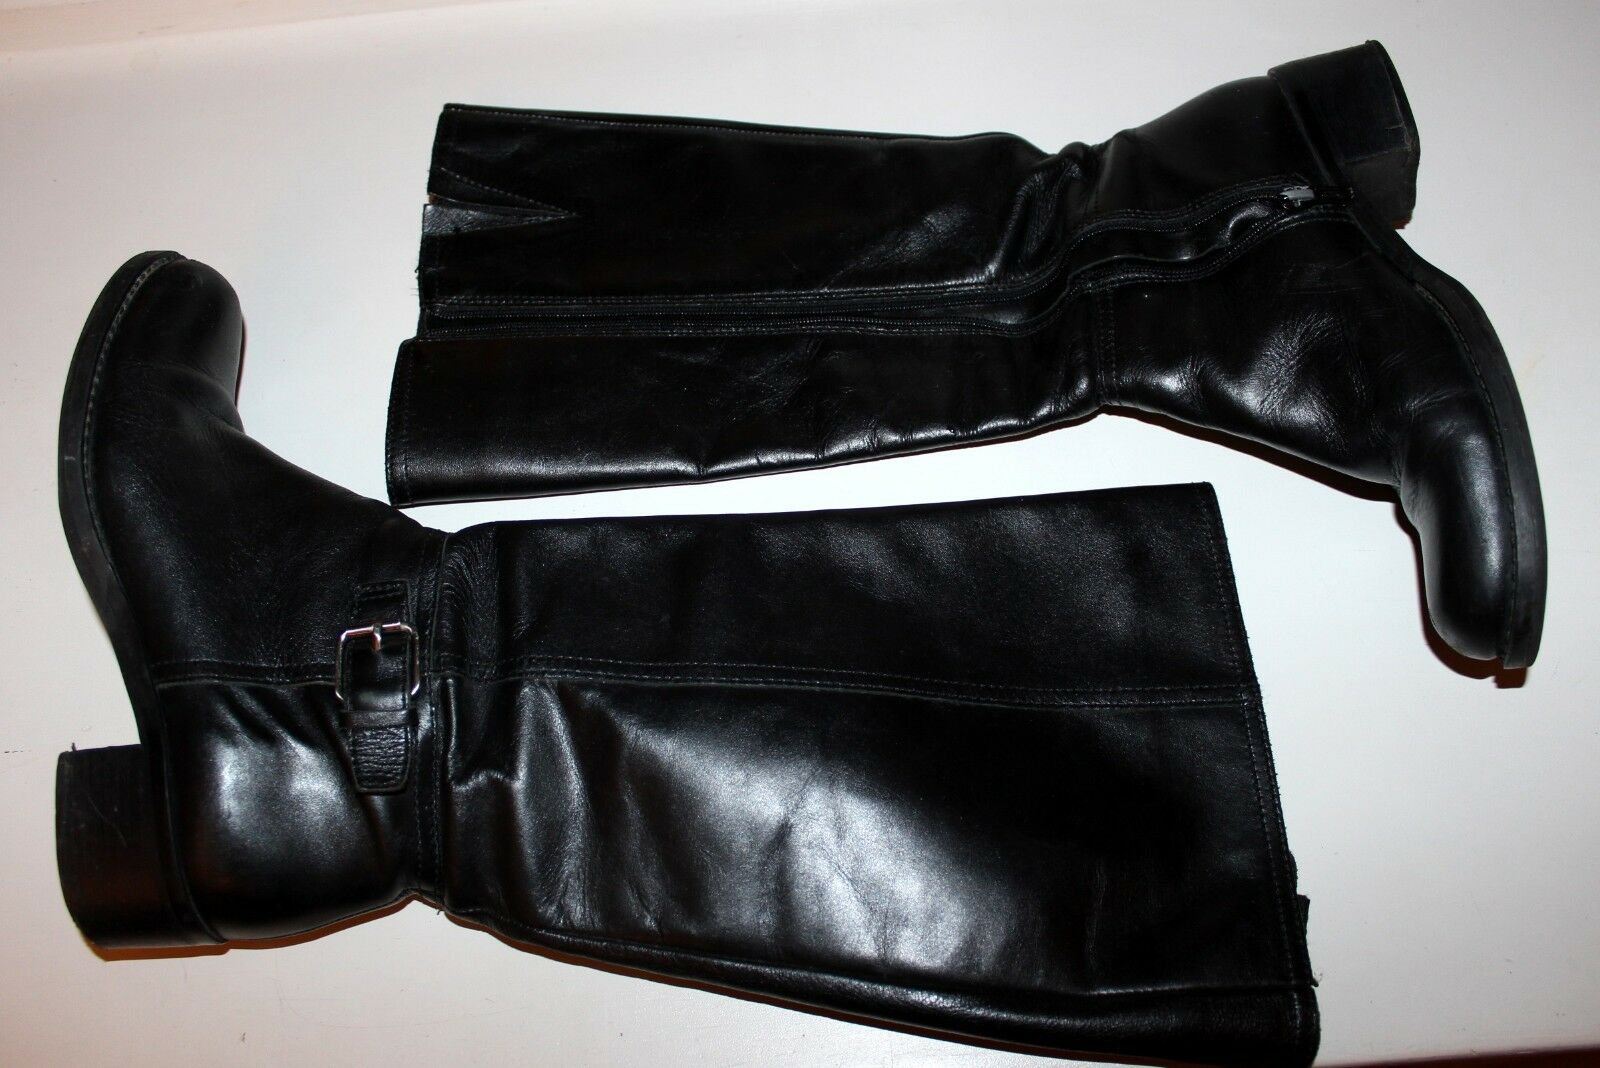 Hunter Original Black Zip Leather Boots Comfy Warm Chic 7.5 40 40.5 M Authentic